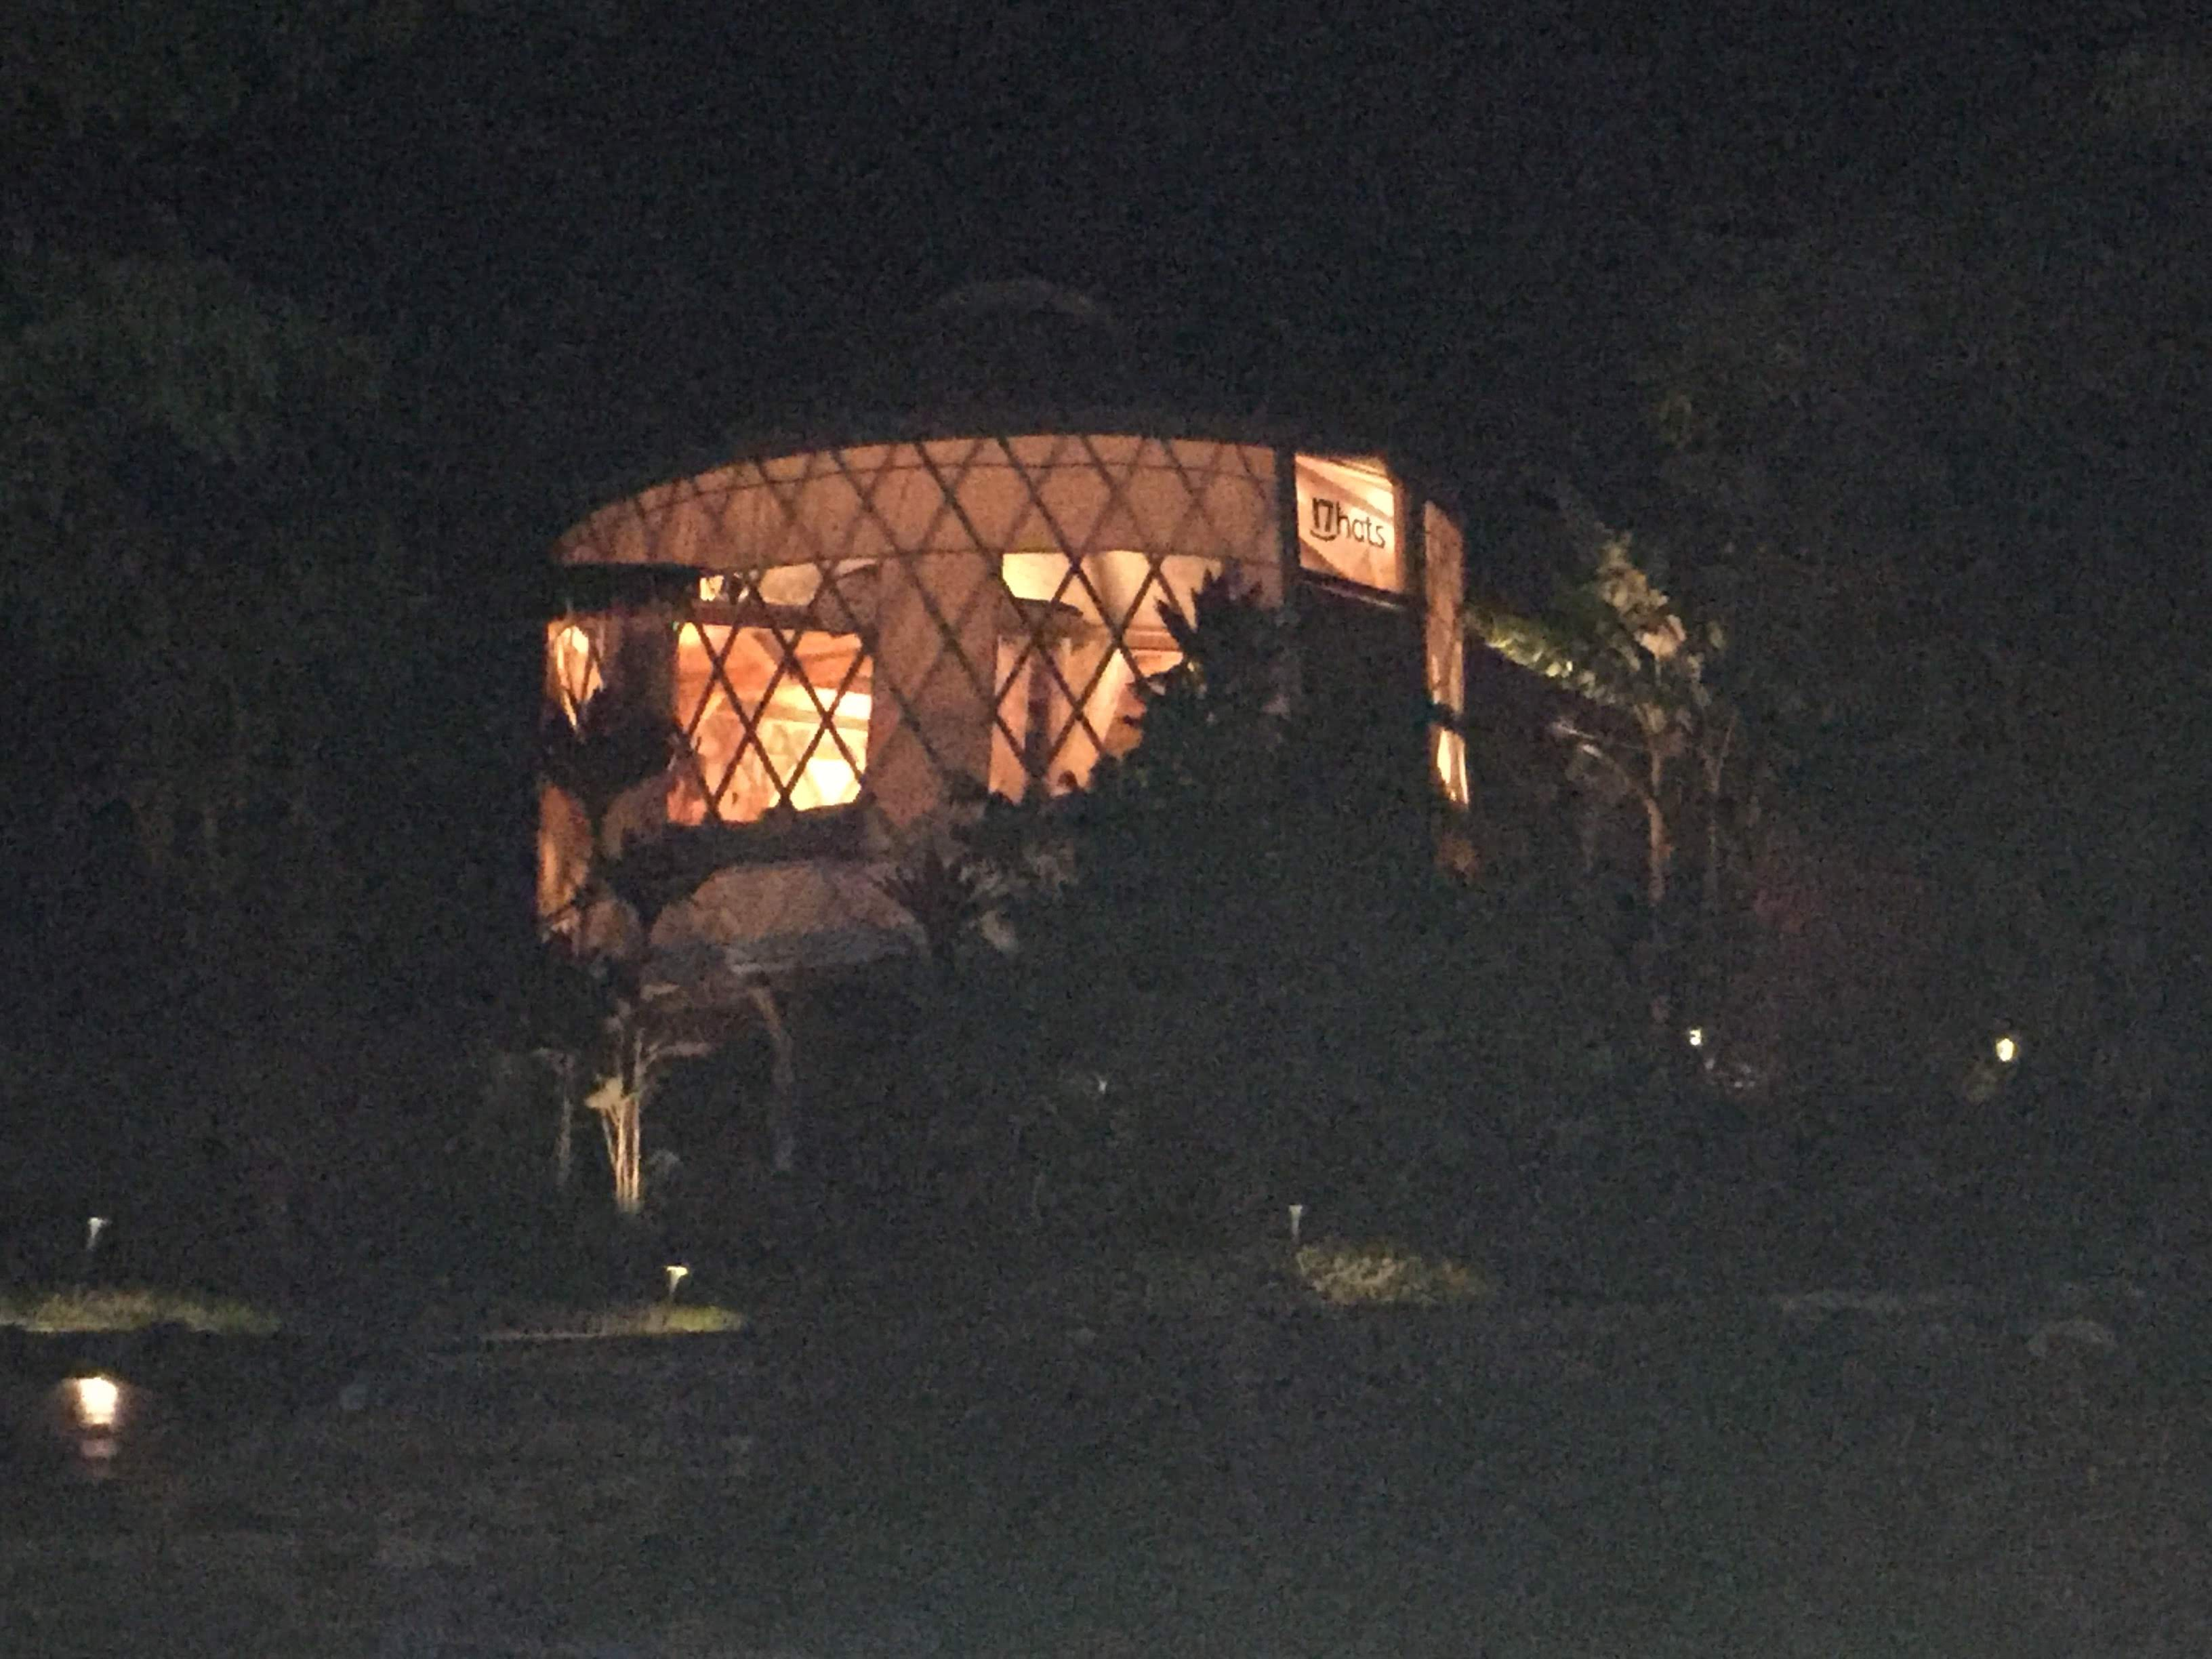 16 foot Diameter 9foot tall walls – African Safari themed Yurt